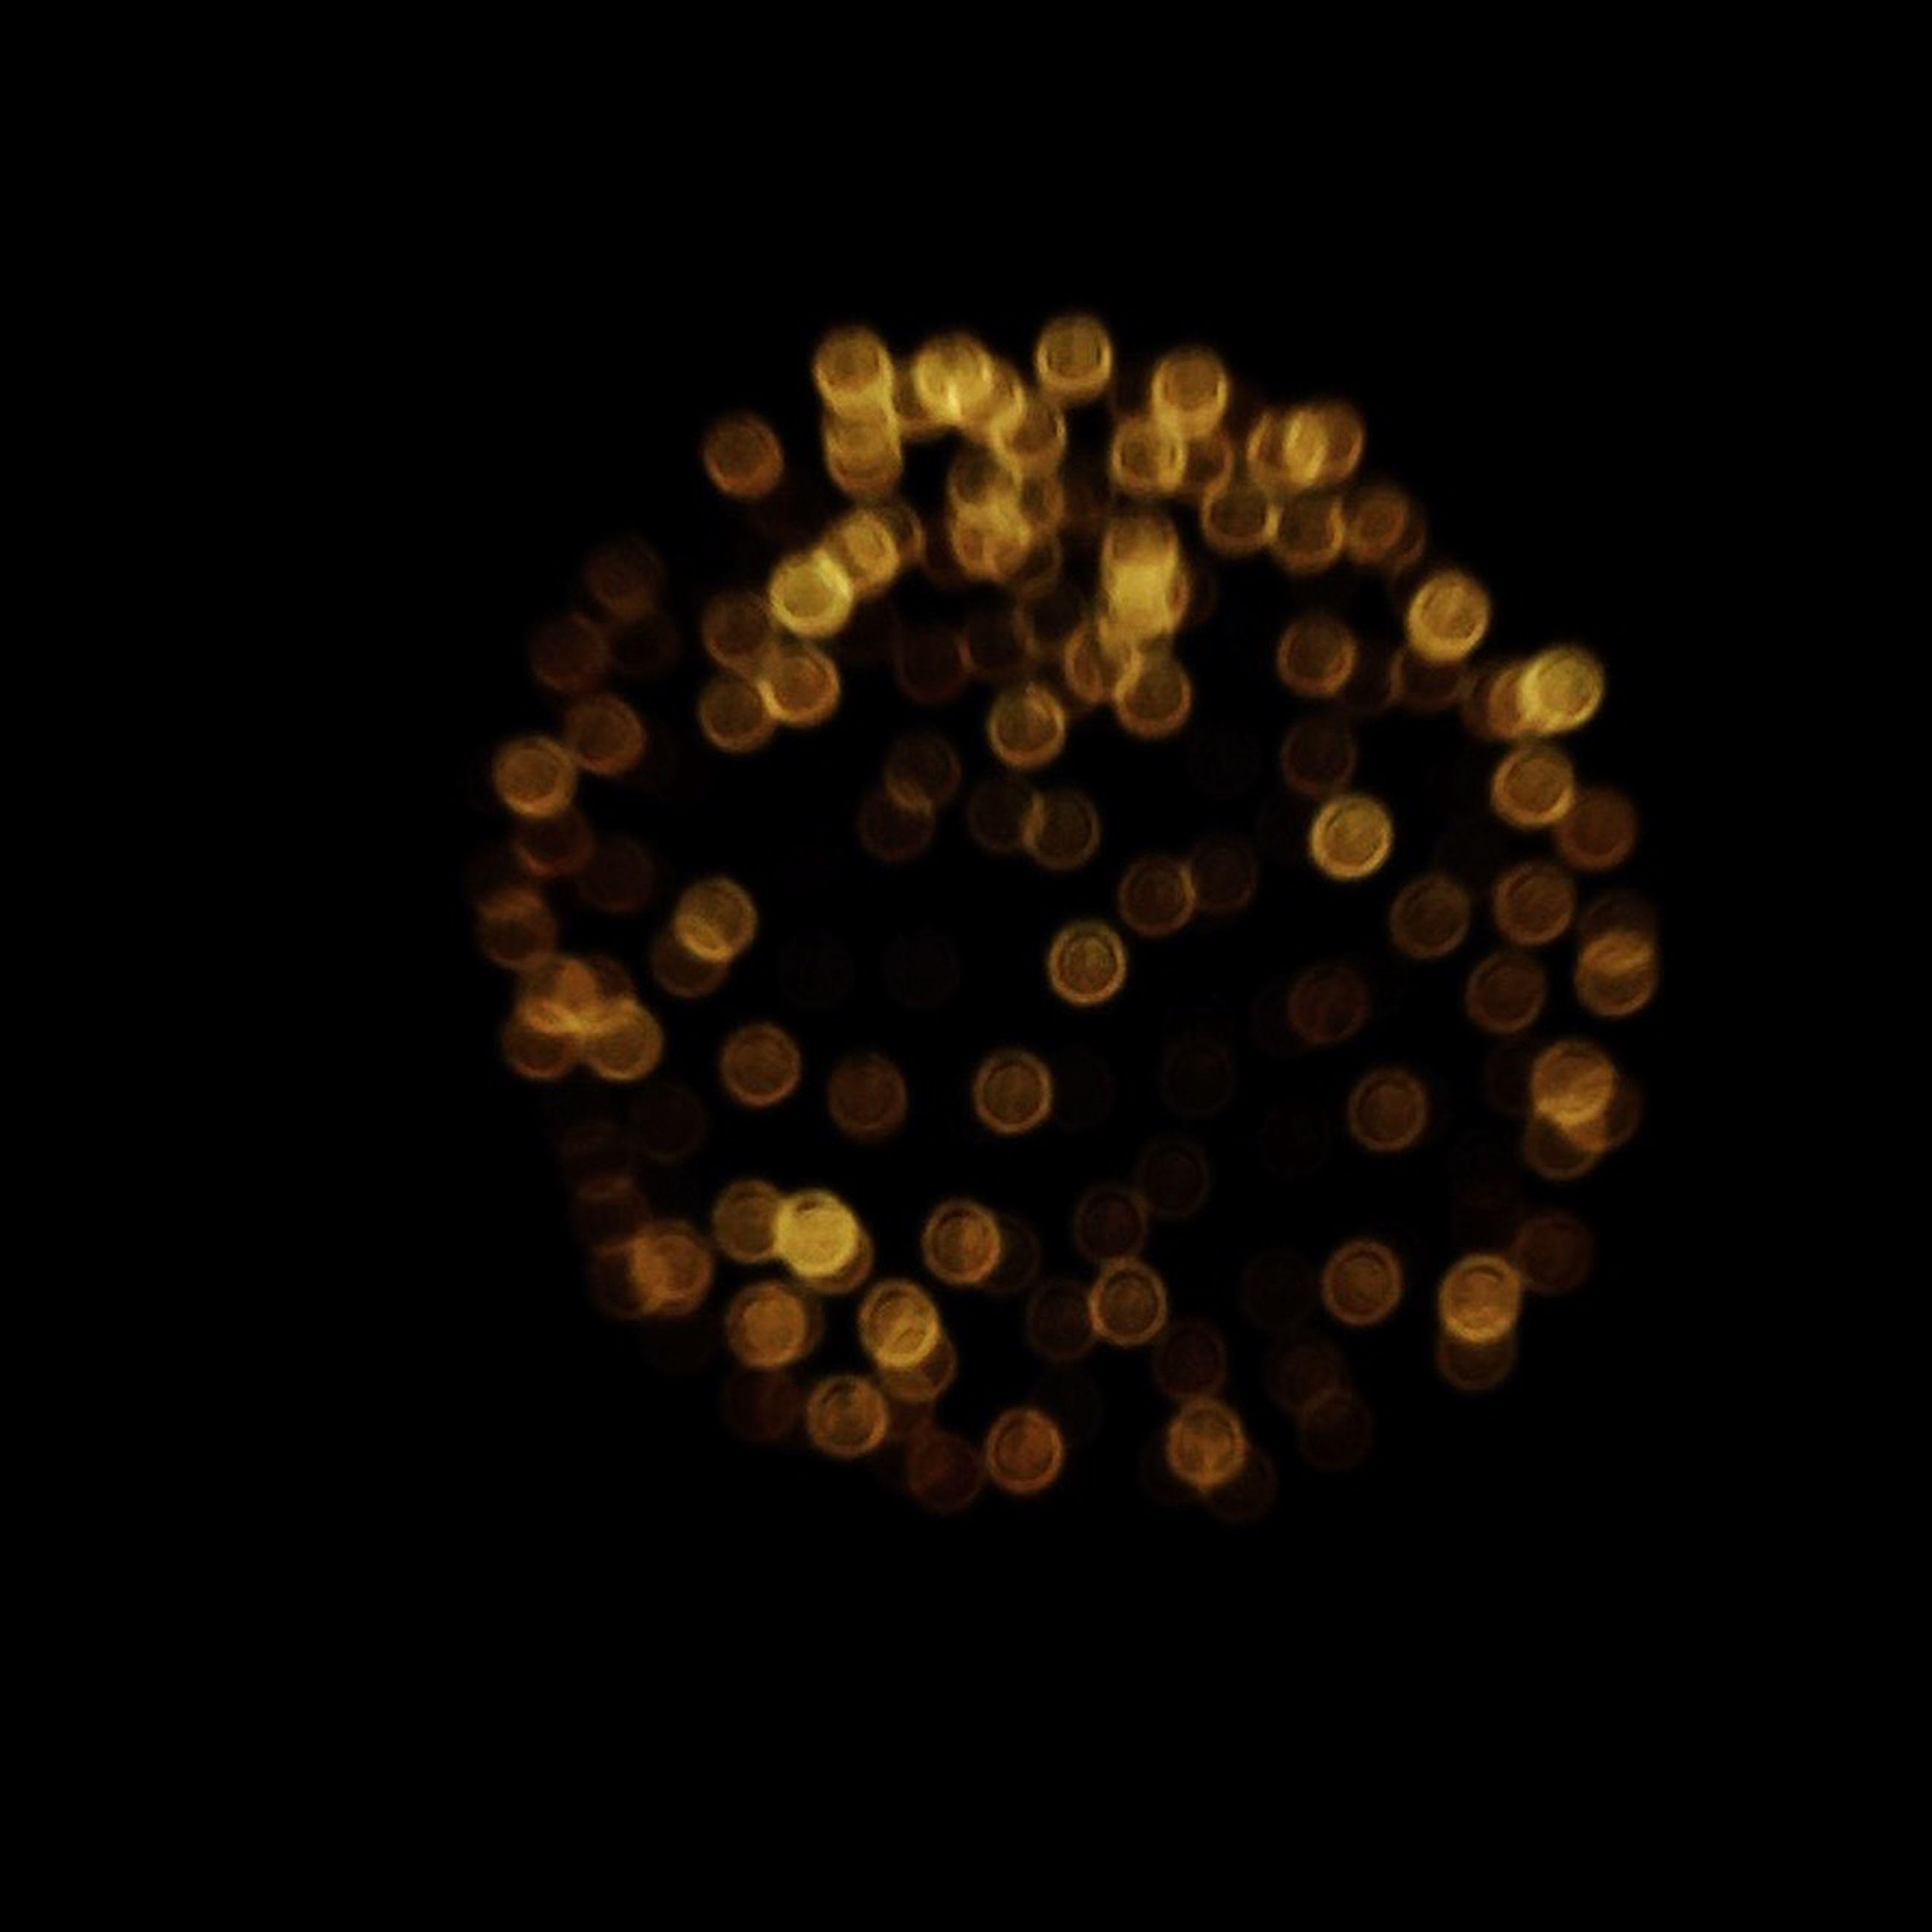 black background, night, studio shot, illuminated, dark, indoors, copy space, close-up, glowing, circle, darkroom, still life, lighting equipment, burning, no people, large group of objects, light - natural phenomenon, lit, flame, heat - temperature